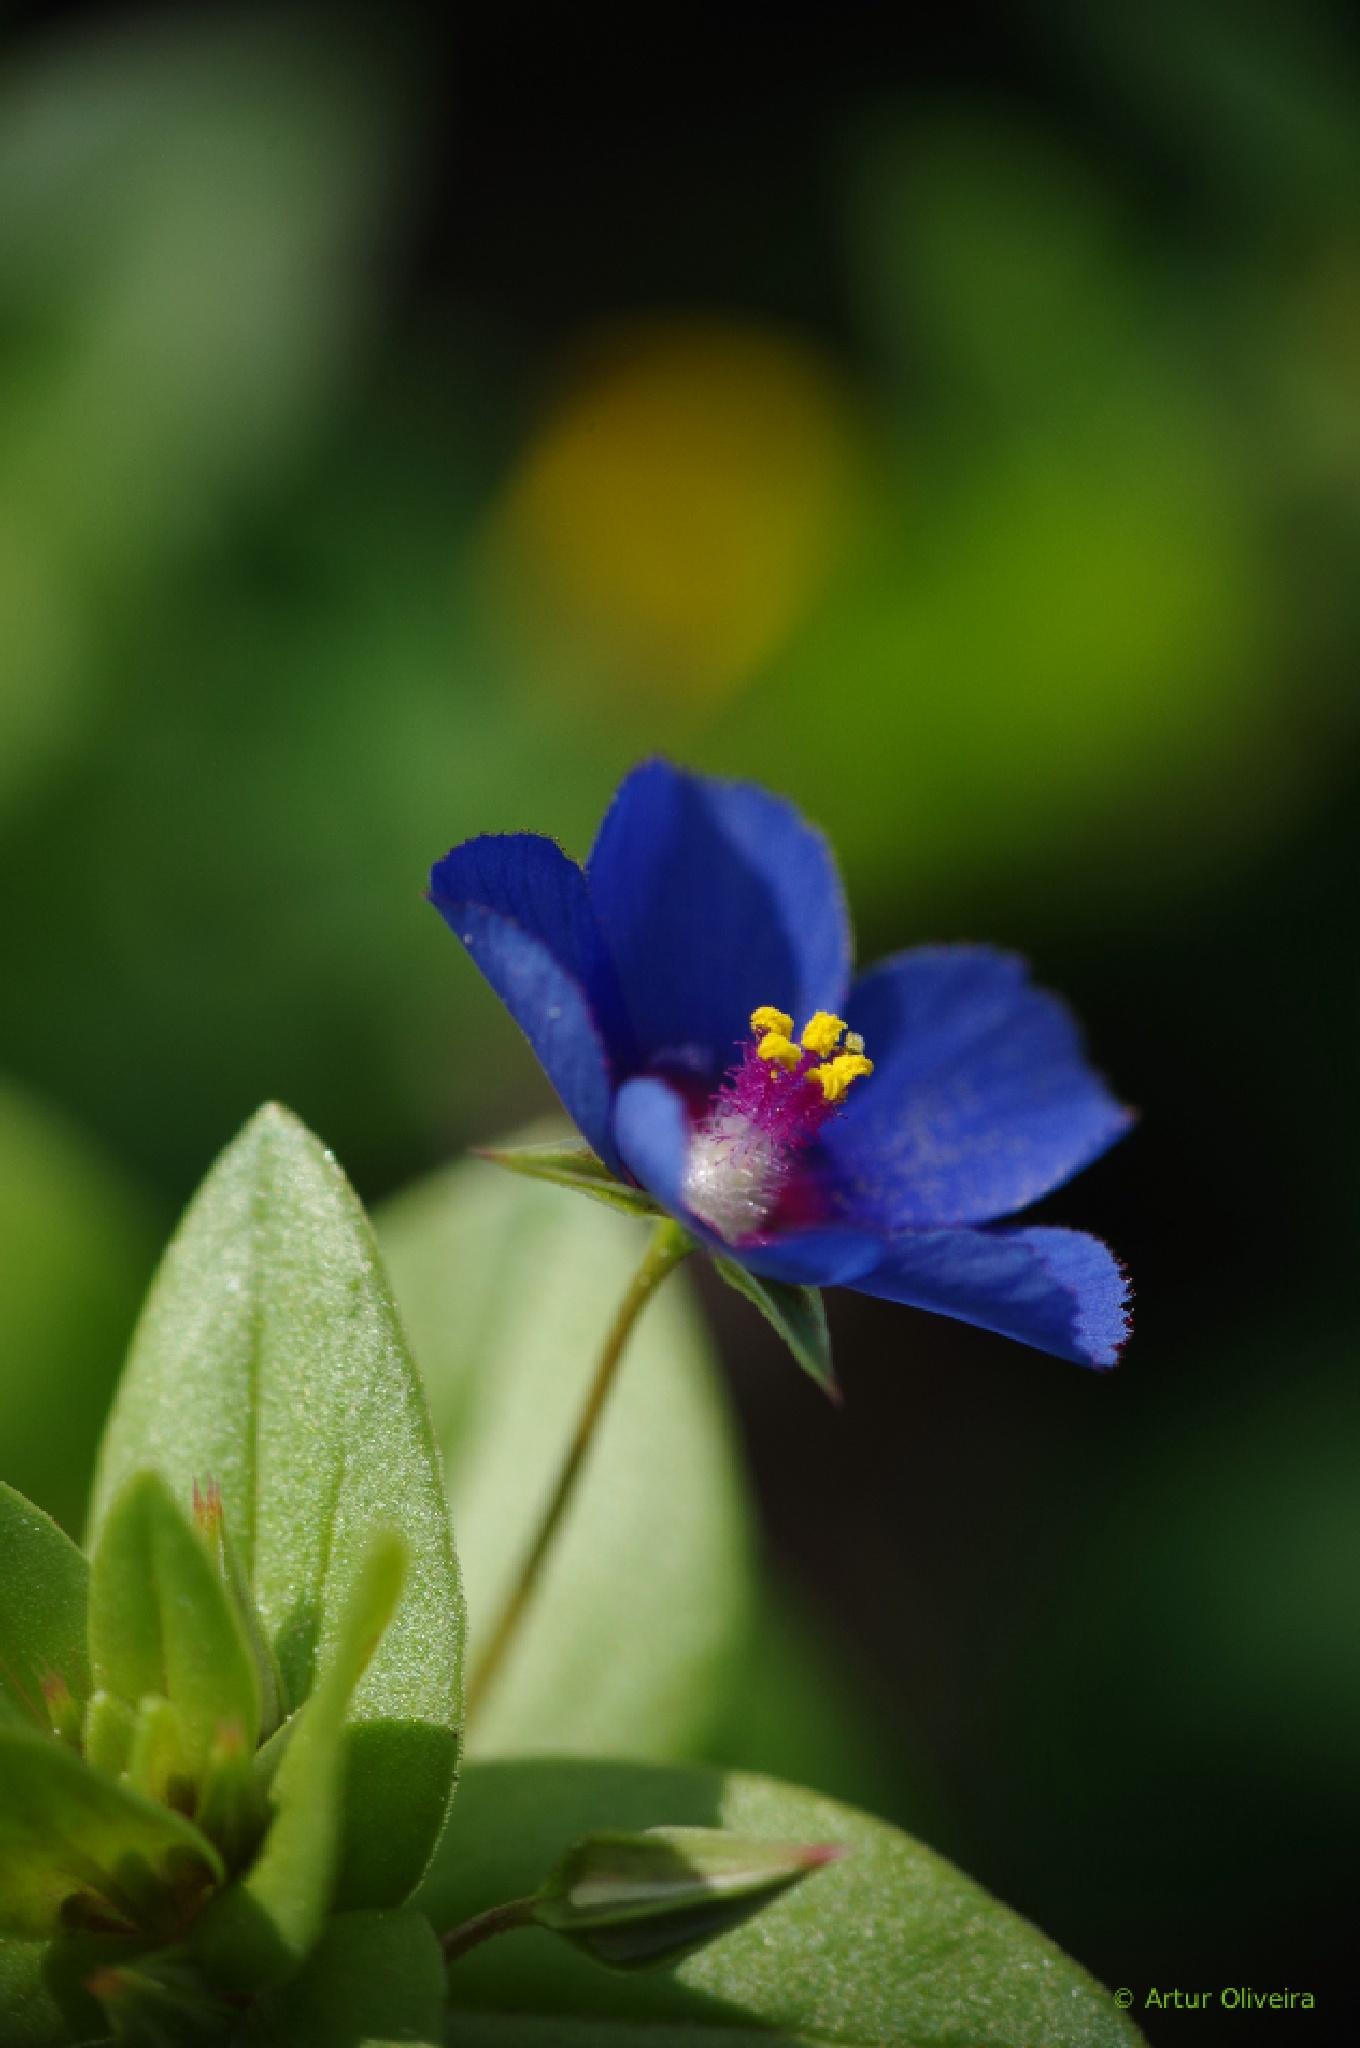 Bleu! Bleu! L'Amour et Bleu ... by Artur Oliveira